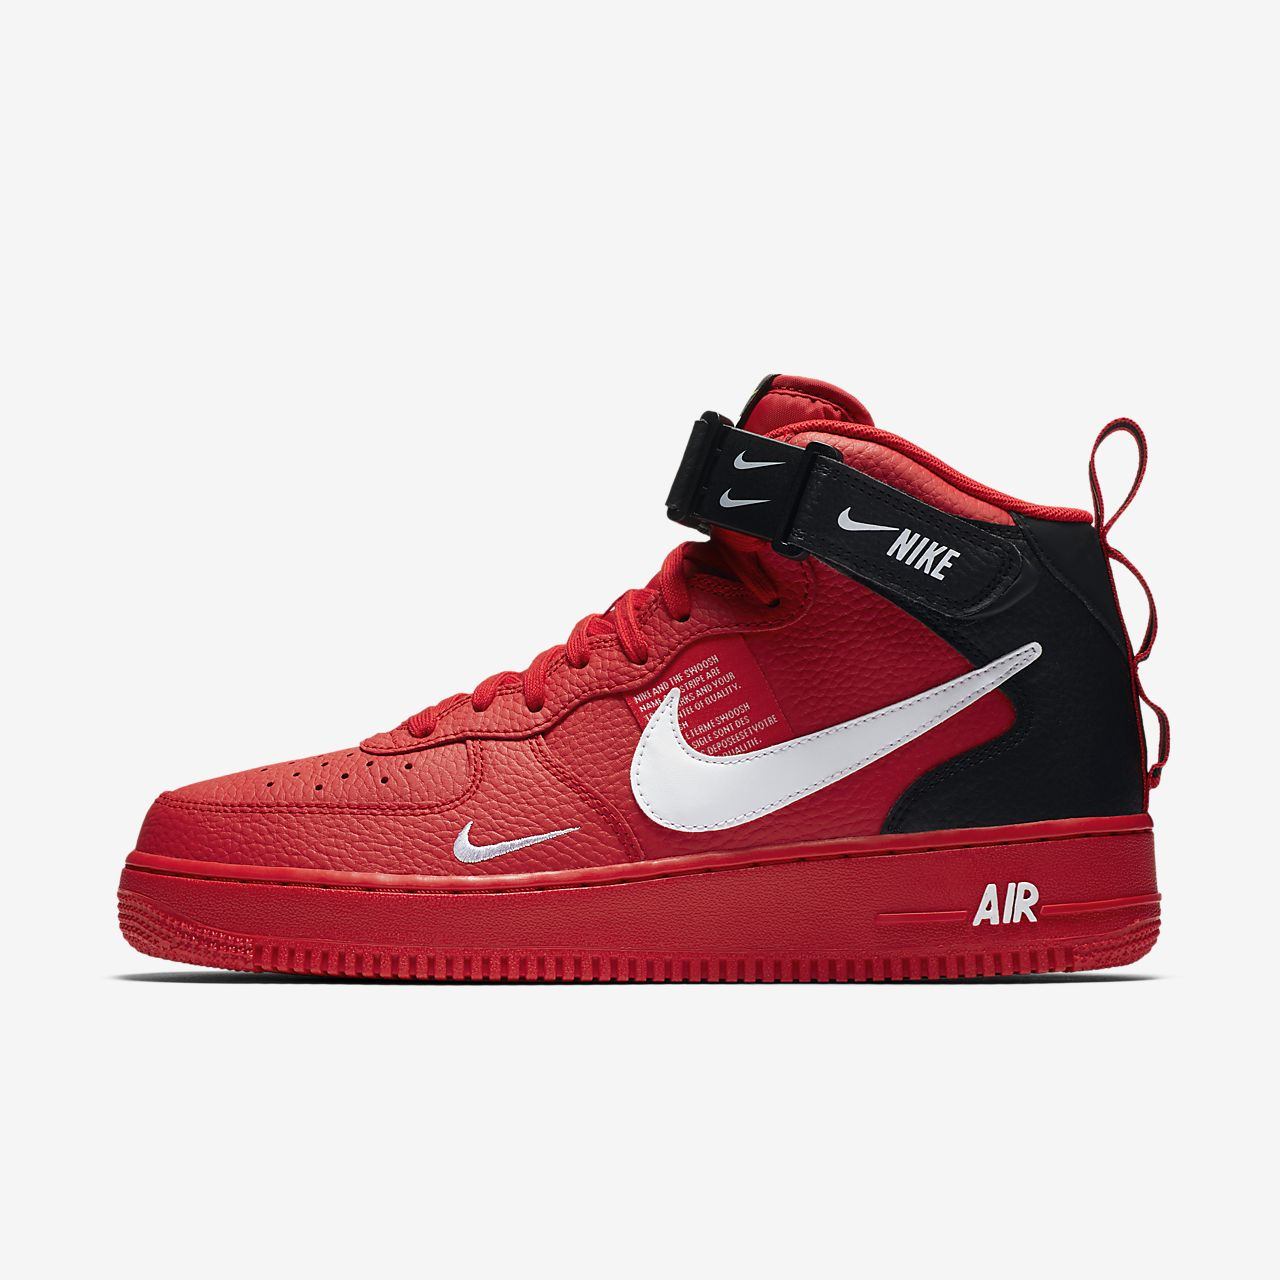 sports shoes d745b 0f9ae denmark scarpa nike air force 1 07 mid lv8 uomo 9eb70 f62cf